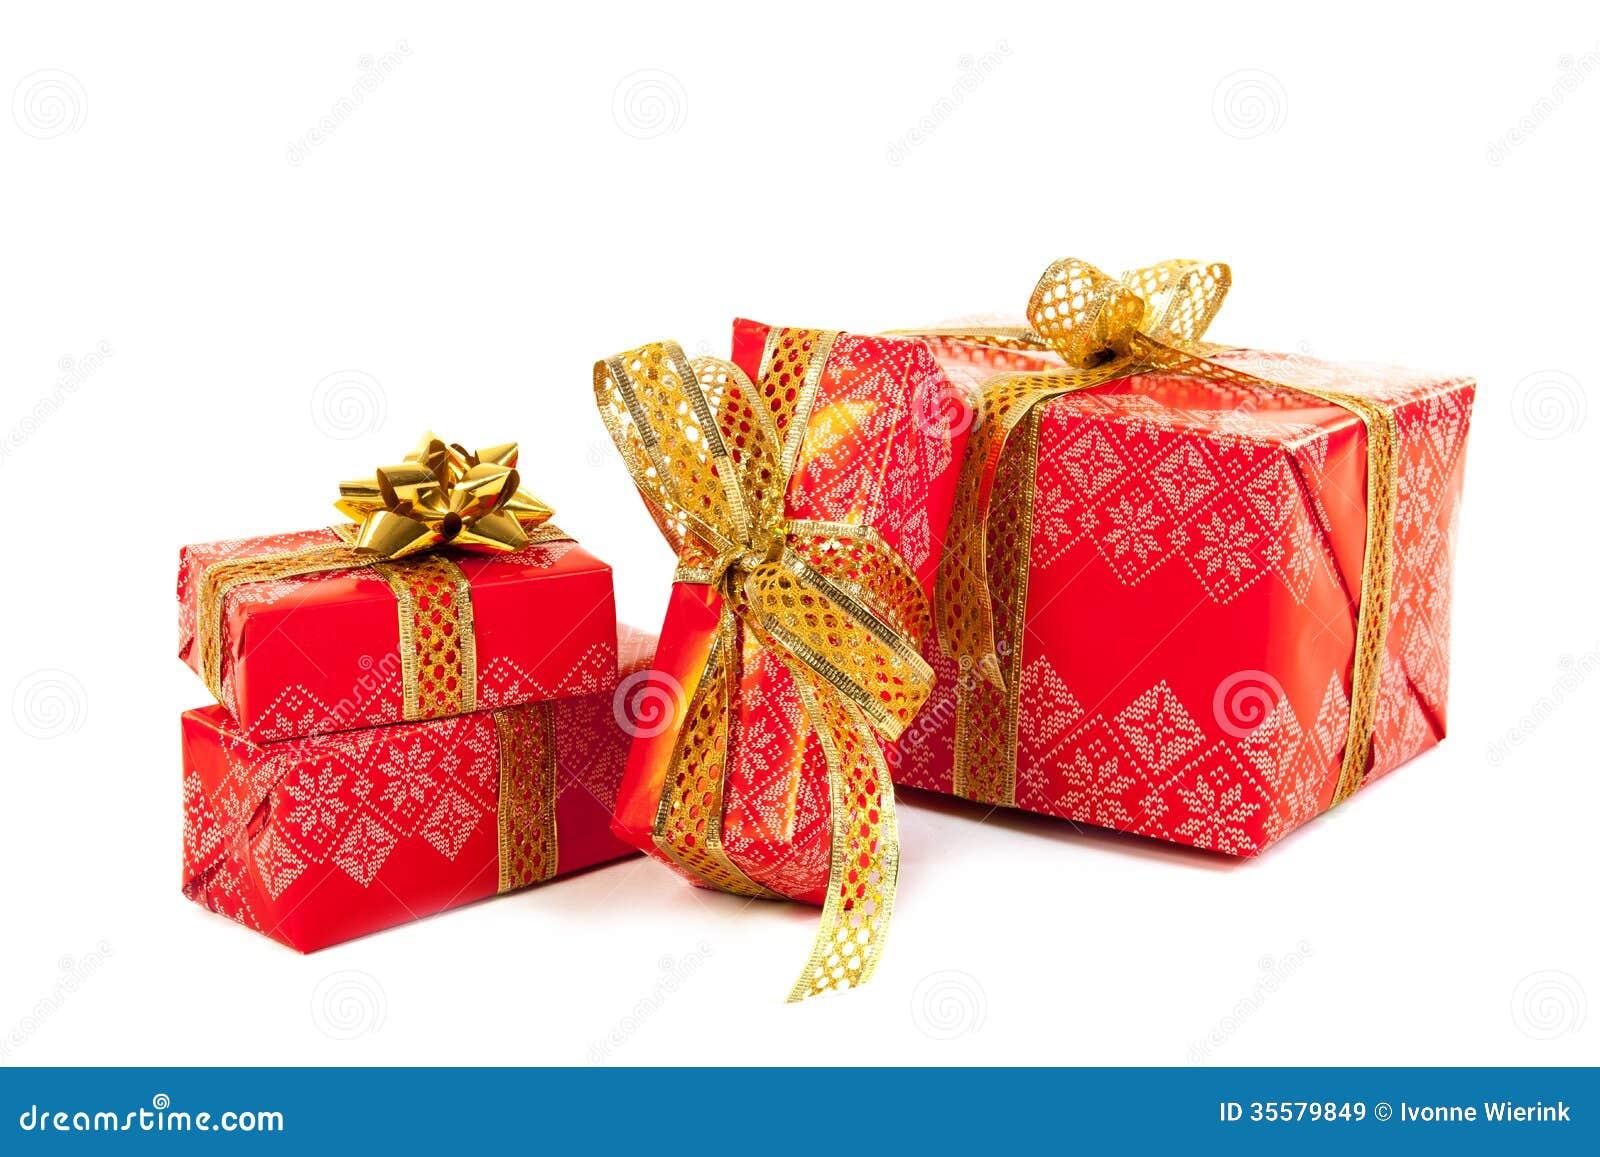 Luxury Xmas Gifts: Red Luxury Christmas Gifts Stock Image. Image Of Studio